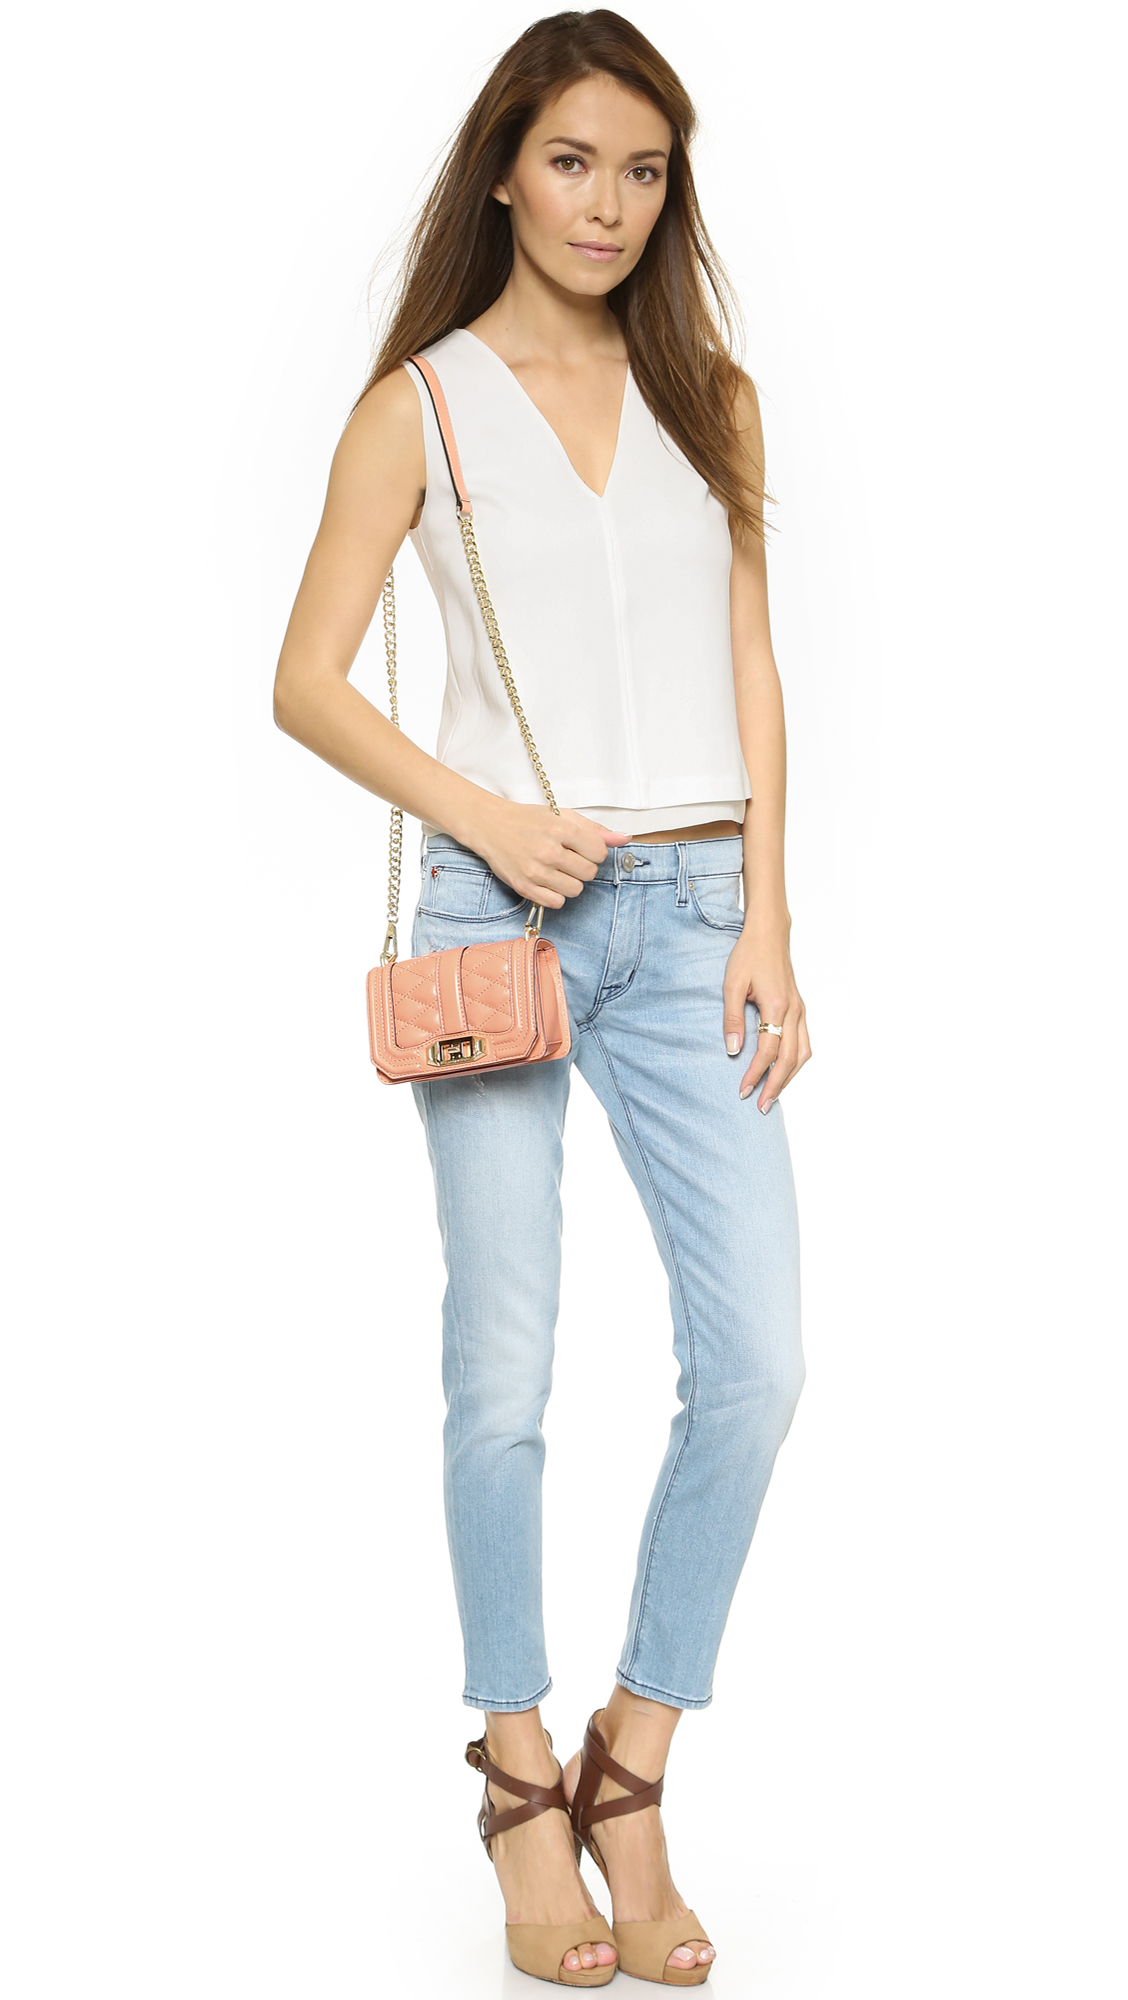 Rebecca Minkoff Mini Love Cross Body Bag - Apricot in Pink